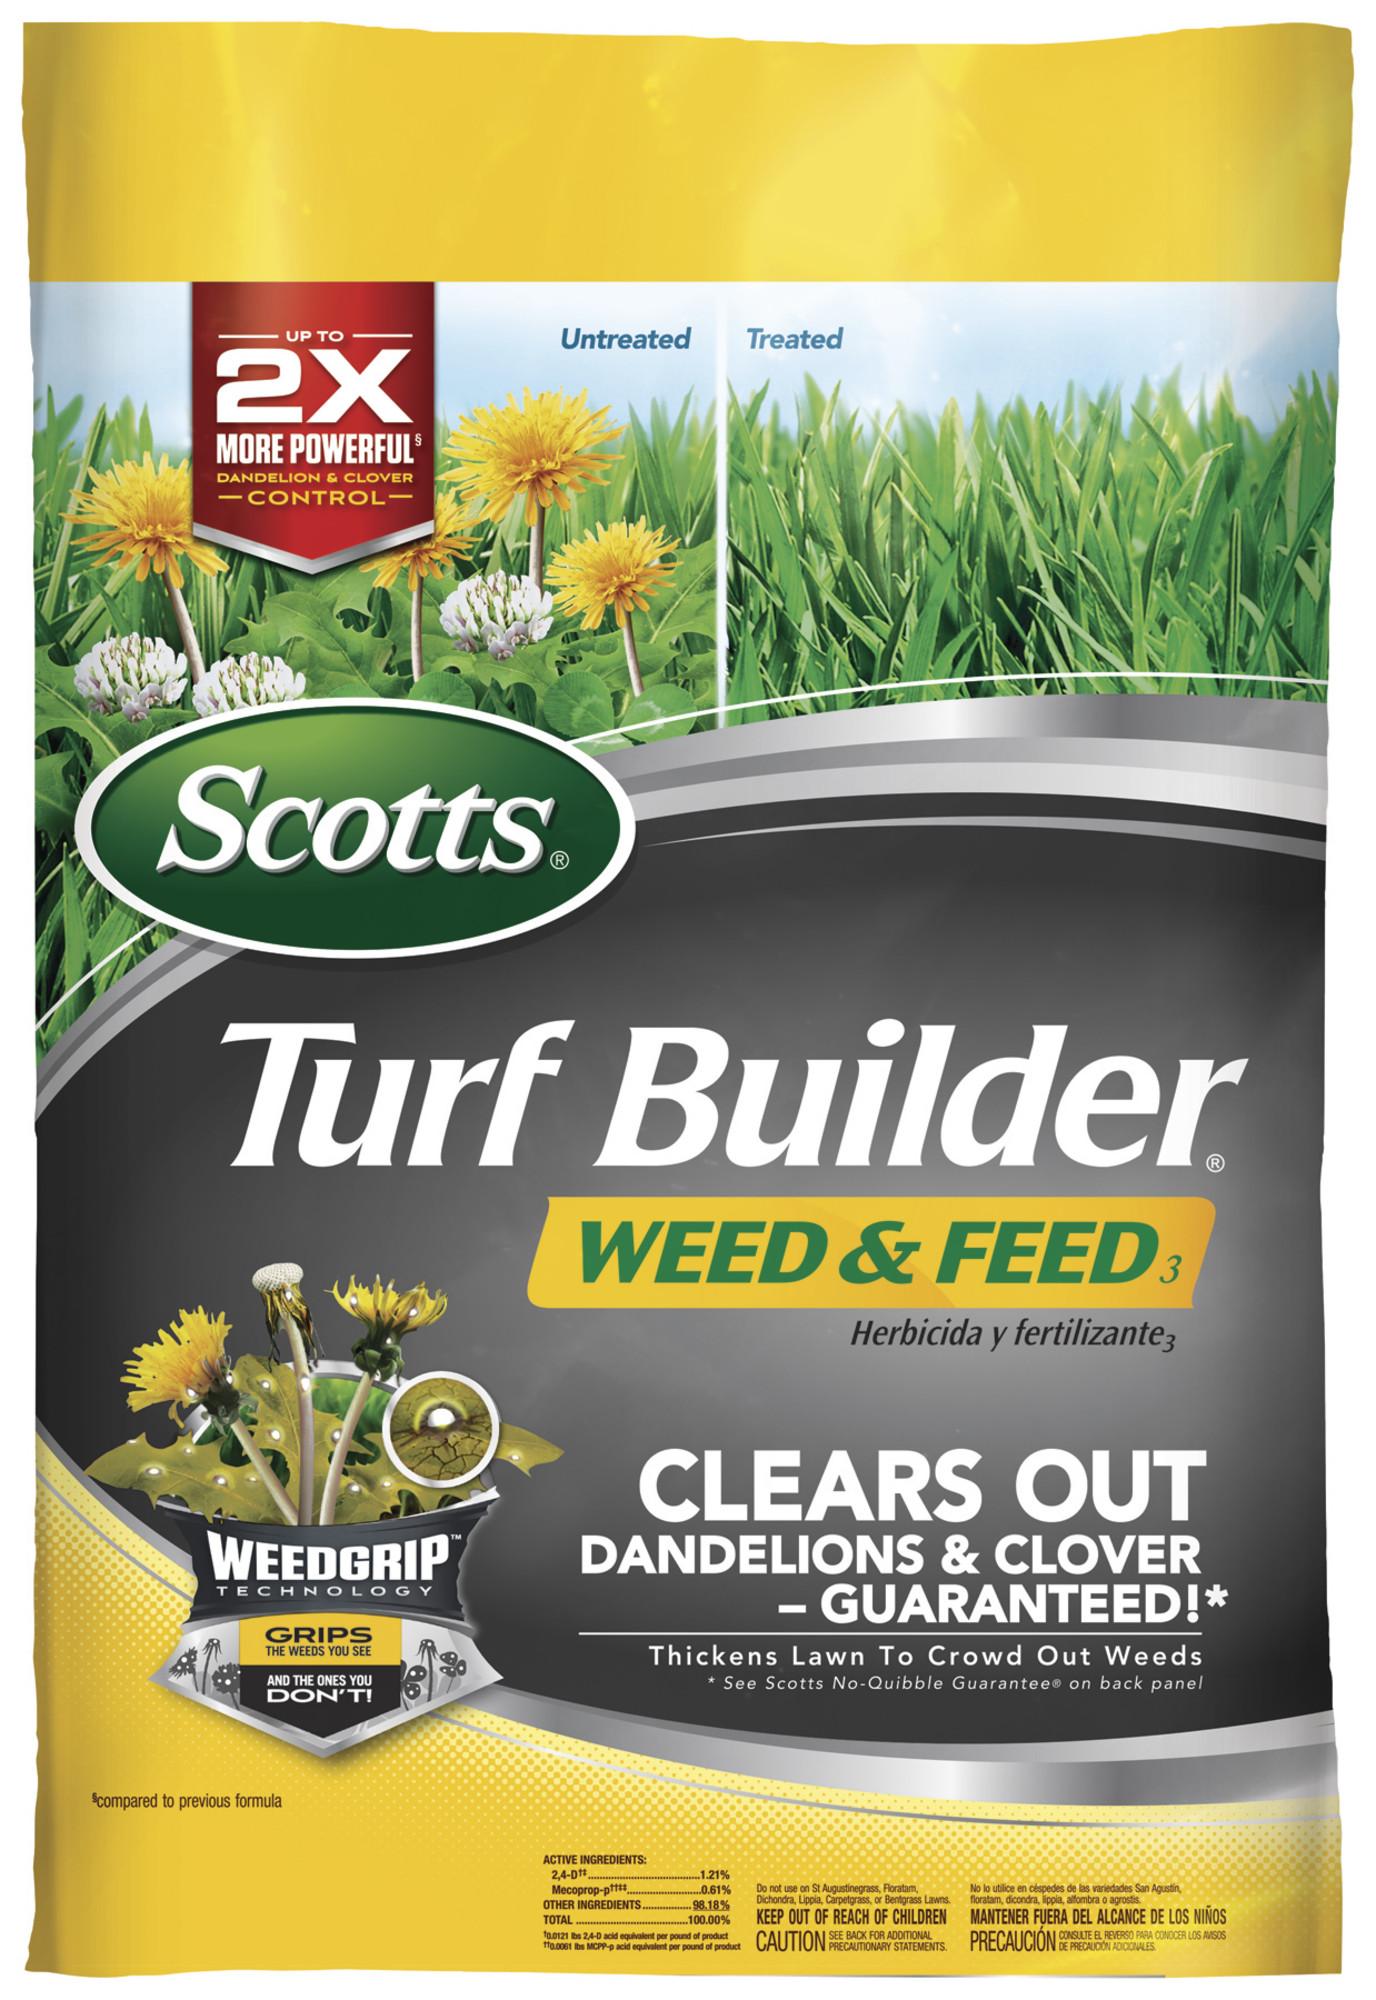 Scotts Turf Builder Weed & Feed 3, 15,000 sq. ft. $32